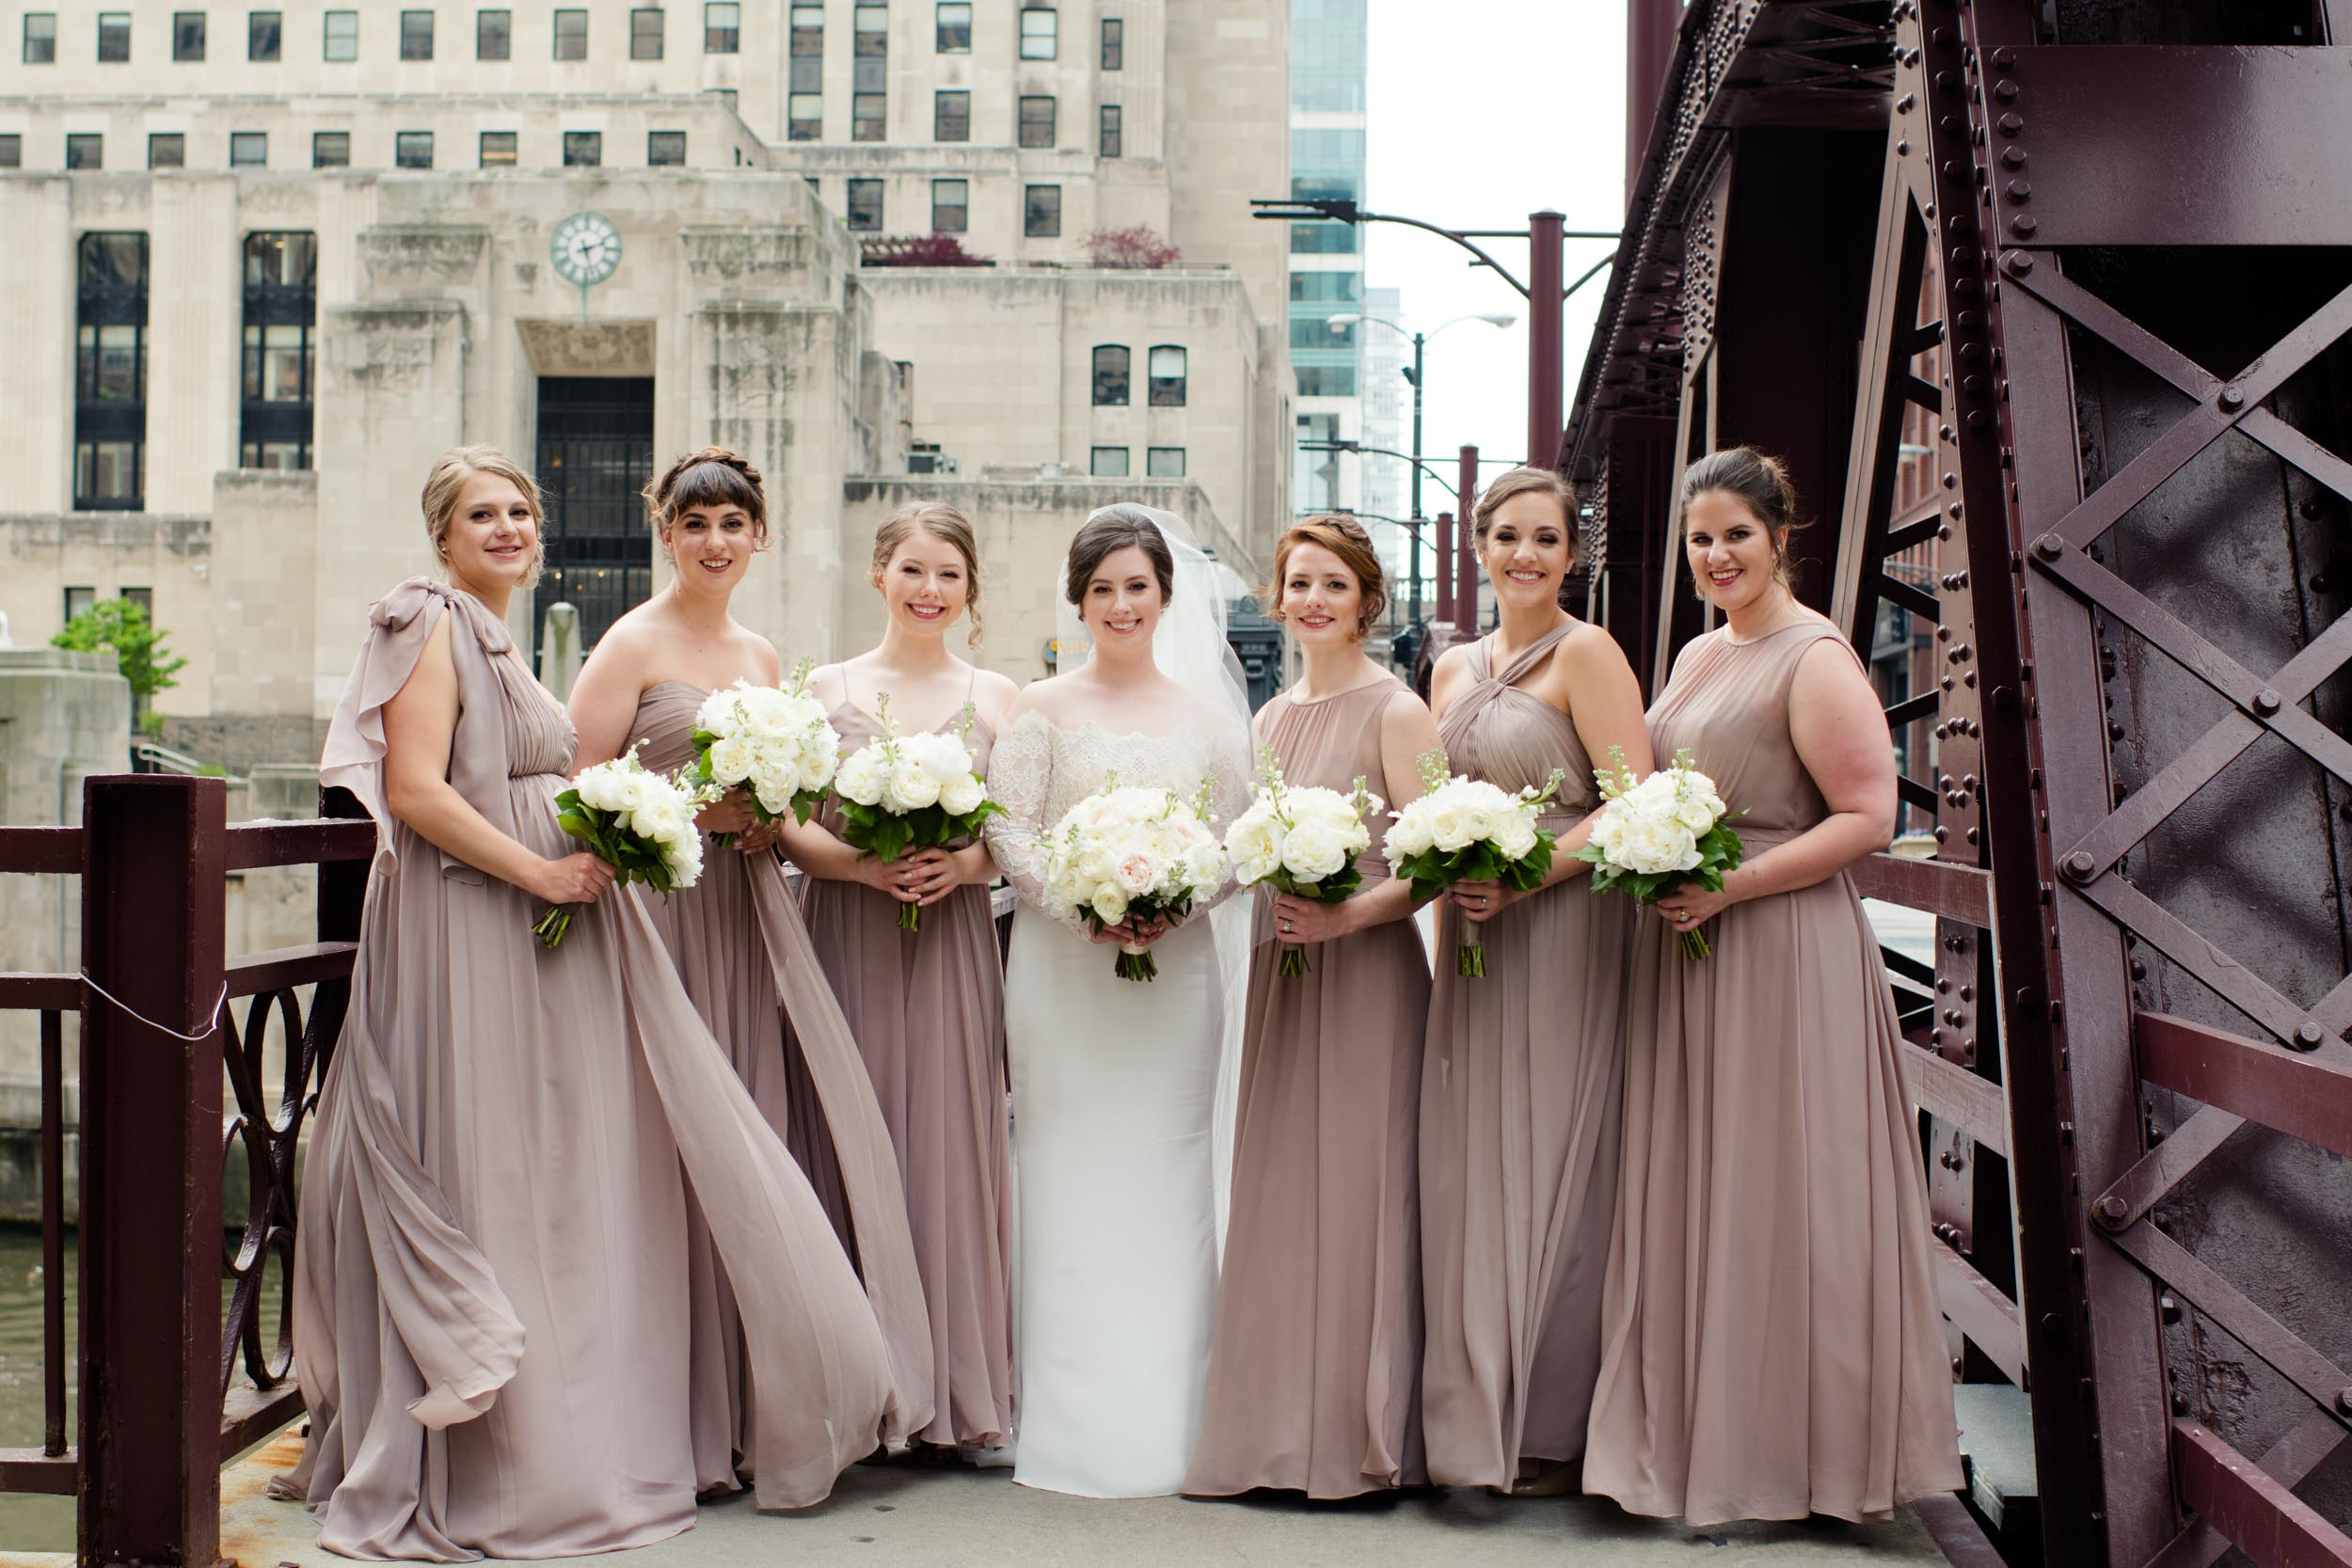 Mismatched rose champagne blush bridesmaids dresses Chicago